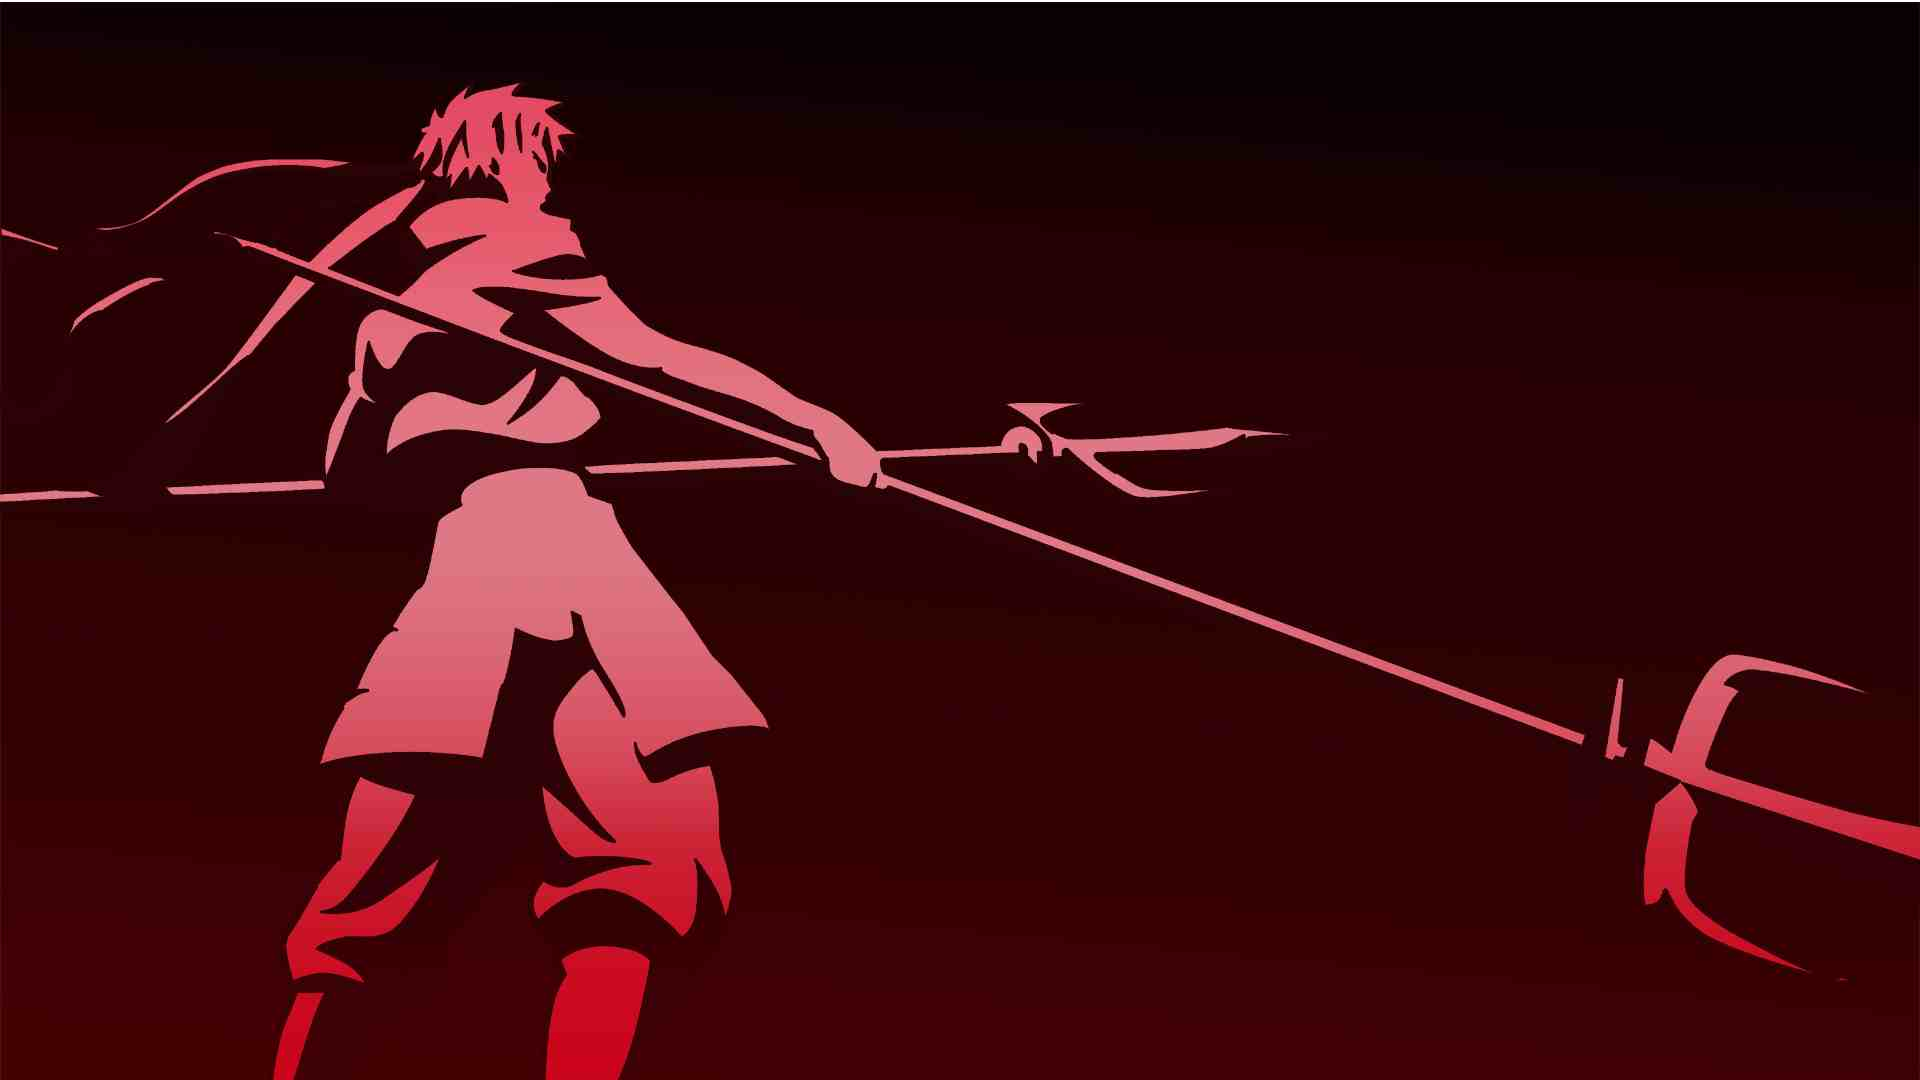 Sengoku Basara 4 releases new trailer